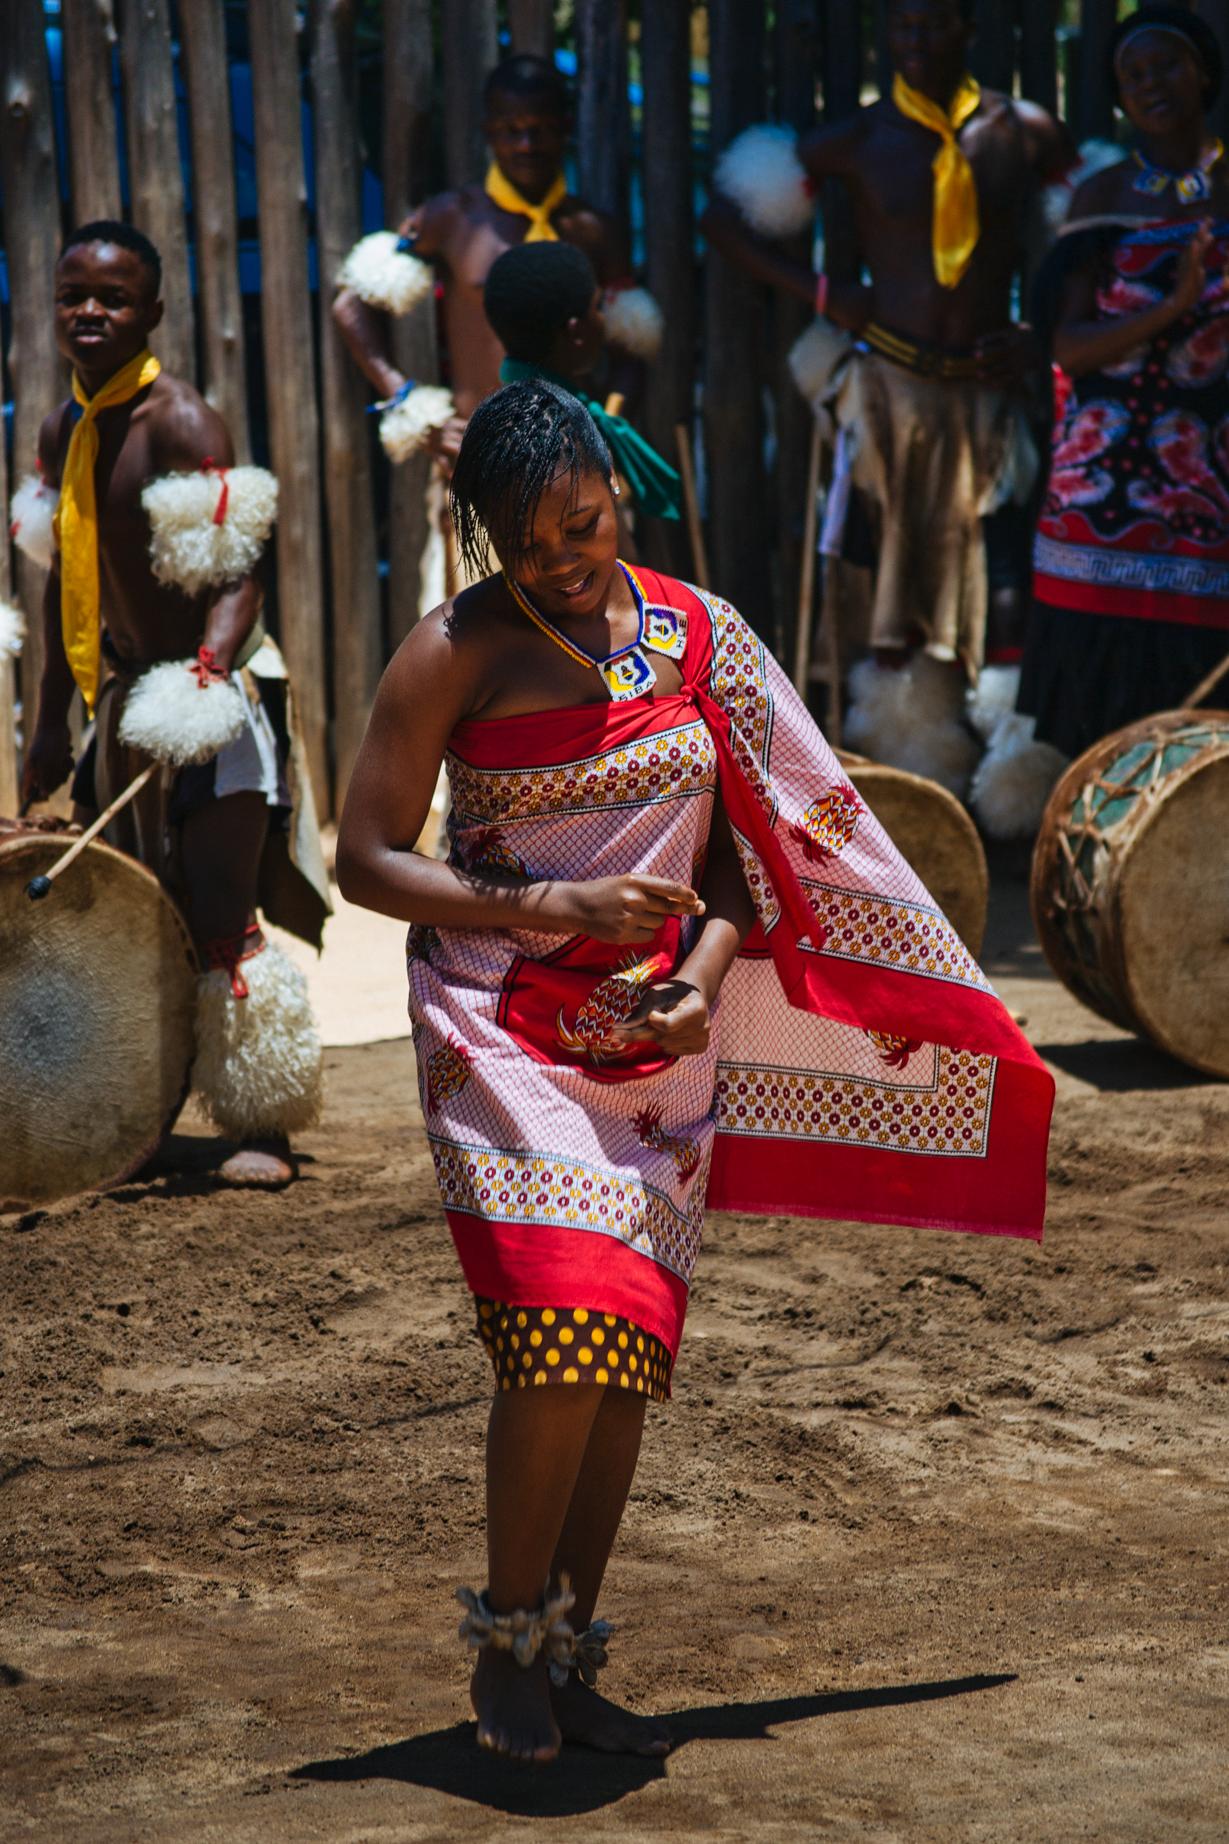 Swaziland Matenga Cultural Village